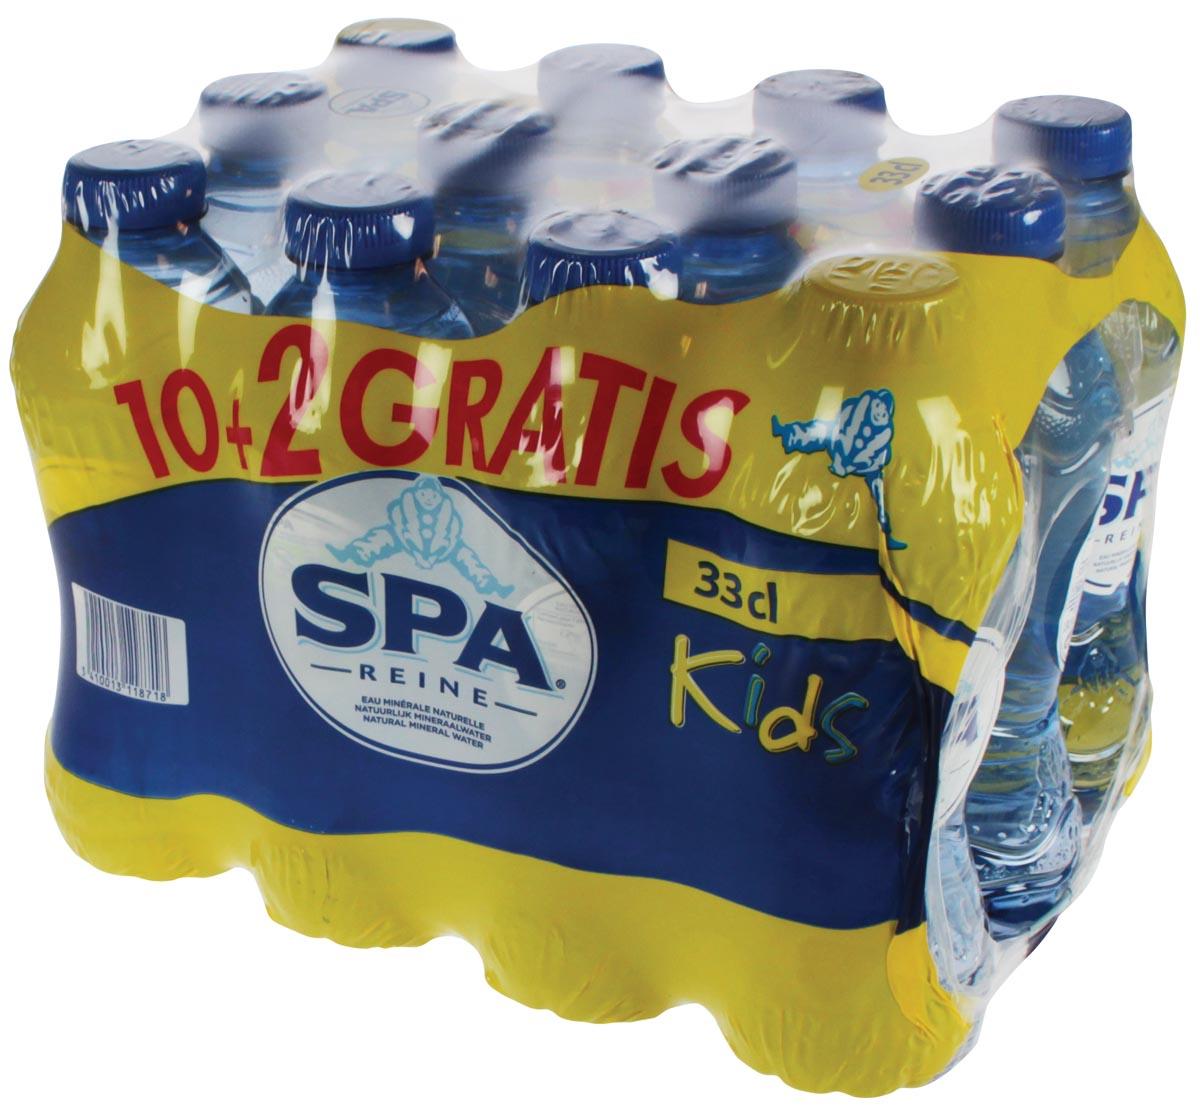 Spa Reine water, fles van 33 cl, pak van 24 stuks-2